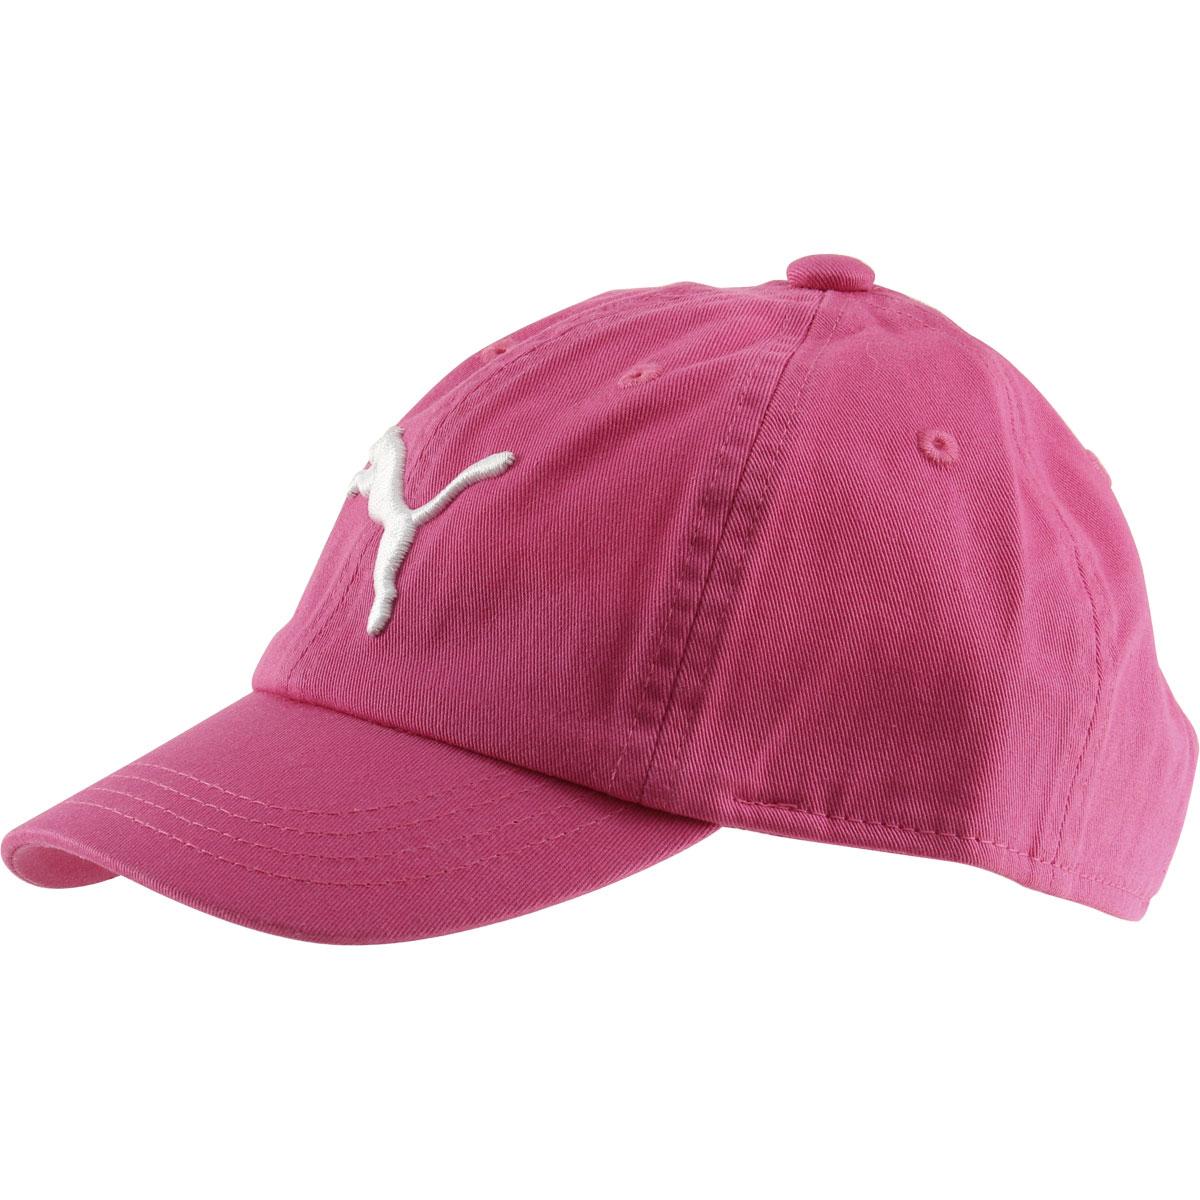 PUMA Girl s Youth Evercat Podium Cotton Baseball Cap Hat Pink  7f5775d07005